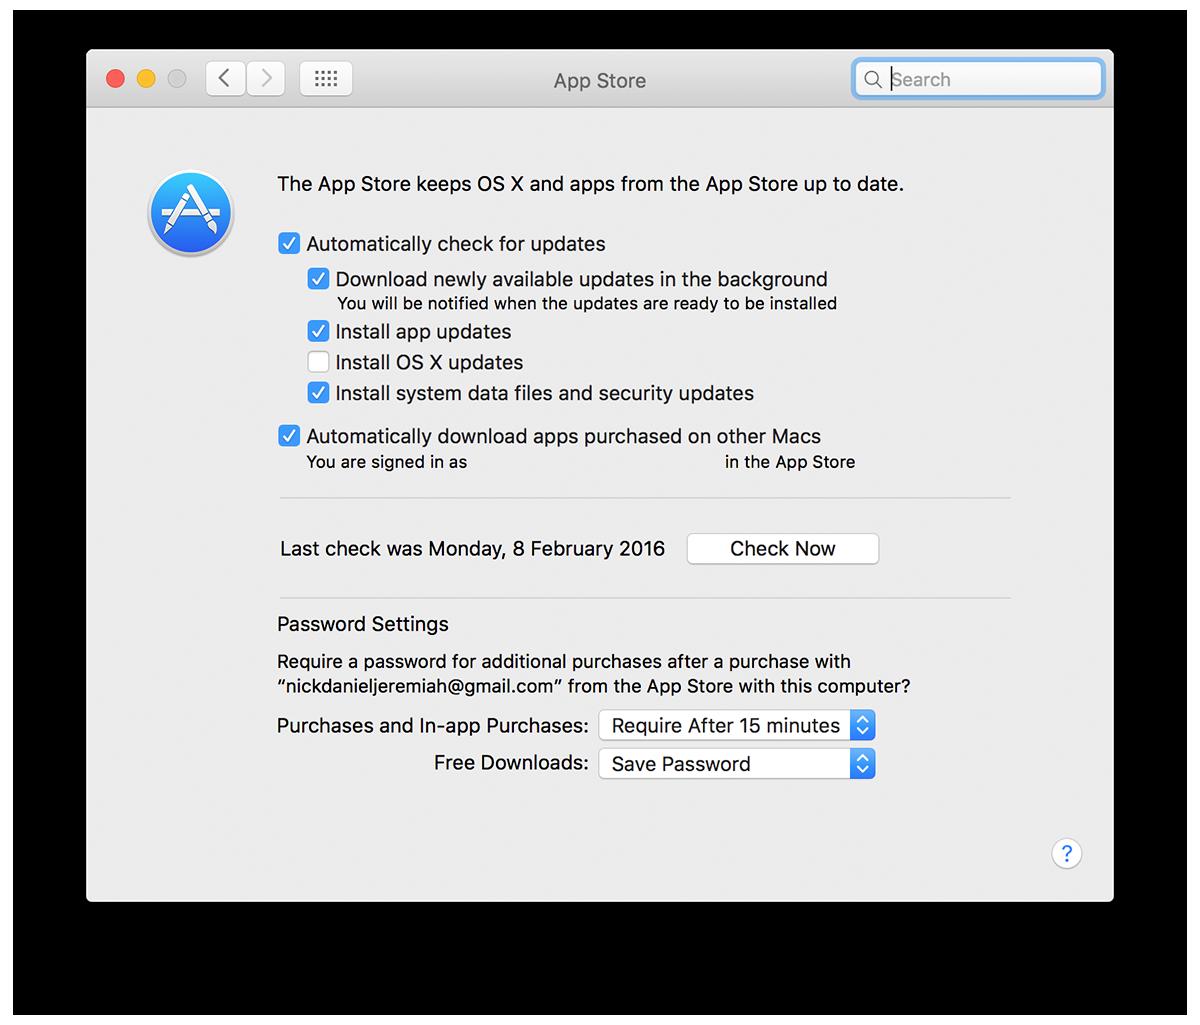 App Store Updates - Mac Maintenance | nickdjeremiah.com